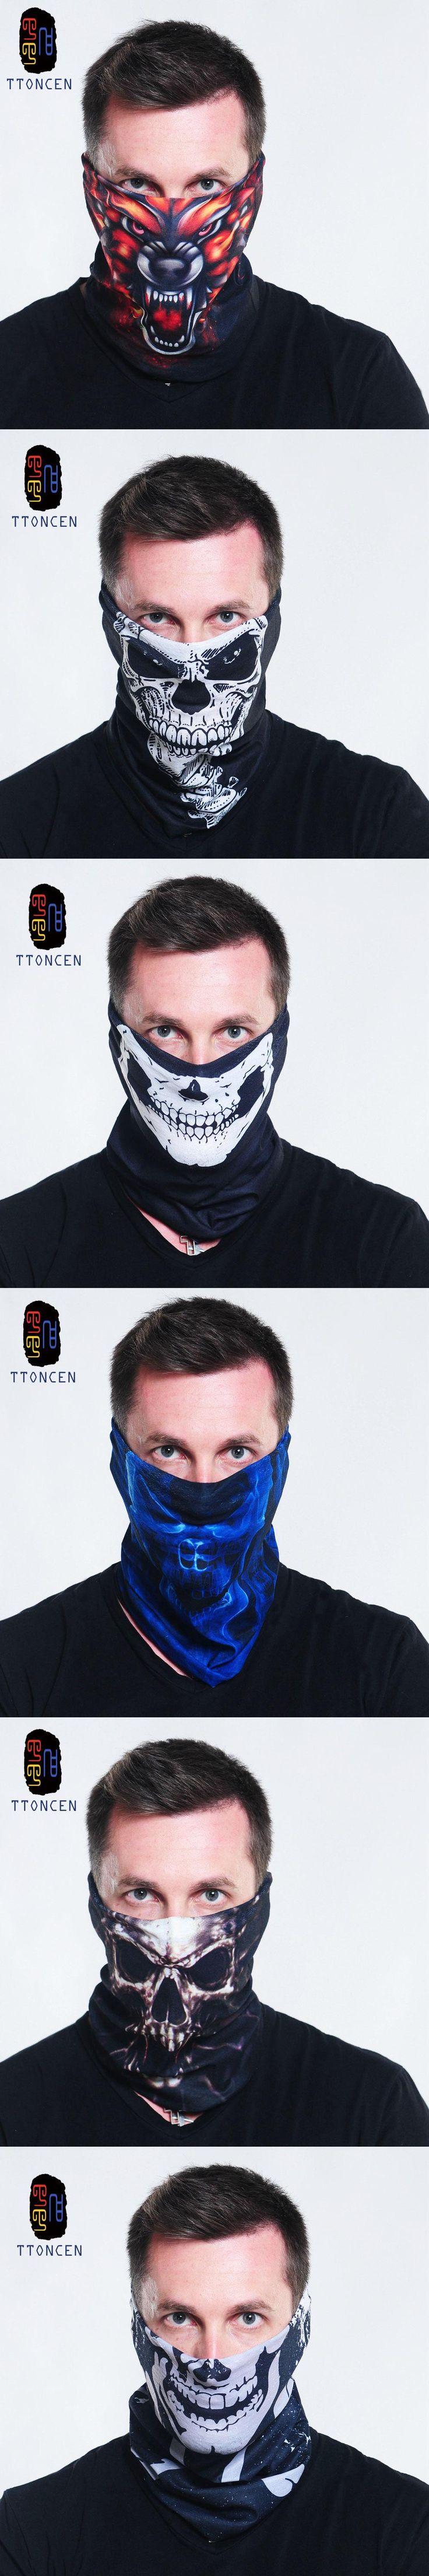 Skull Bandana Stretchable Tubular Bandana For  25*48cm Face Mask Cap Neck Tube Multifunctional Scarf Men Magic skull headwear